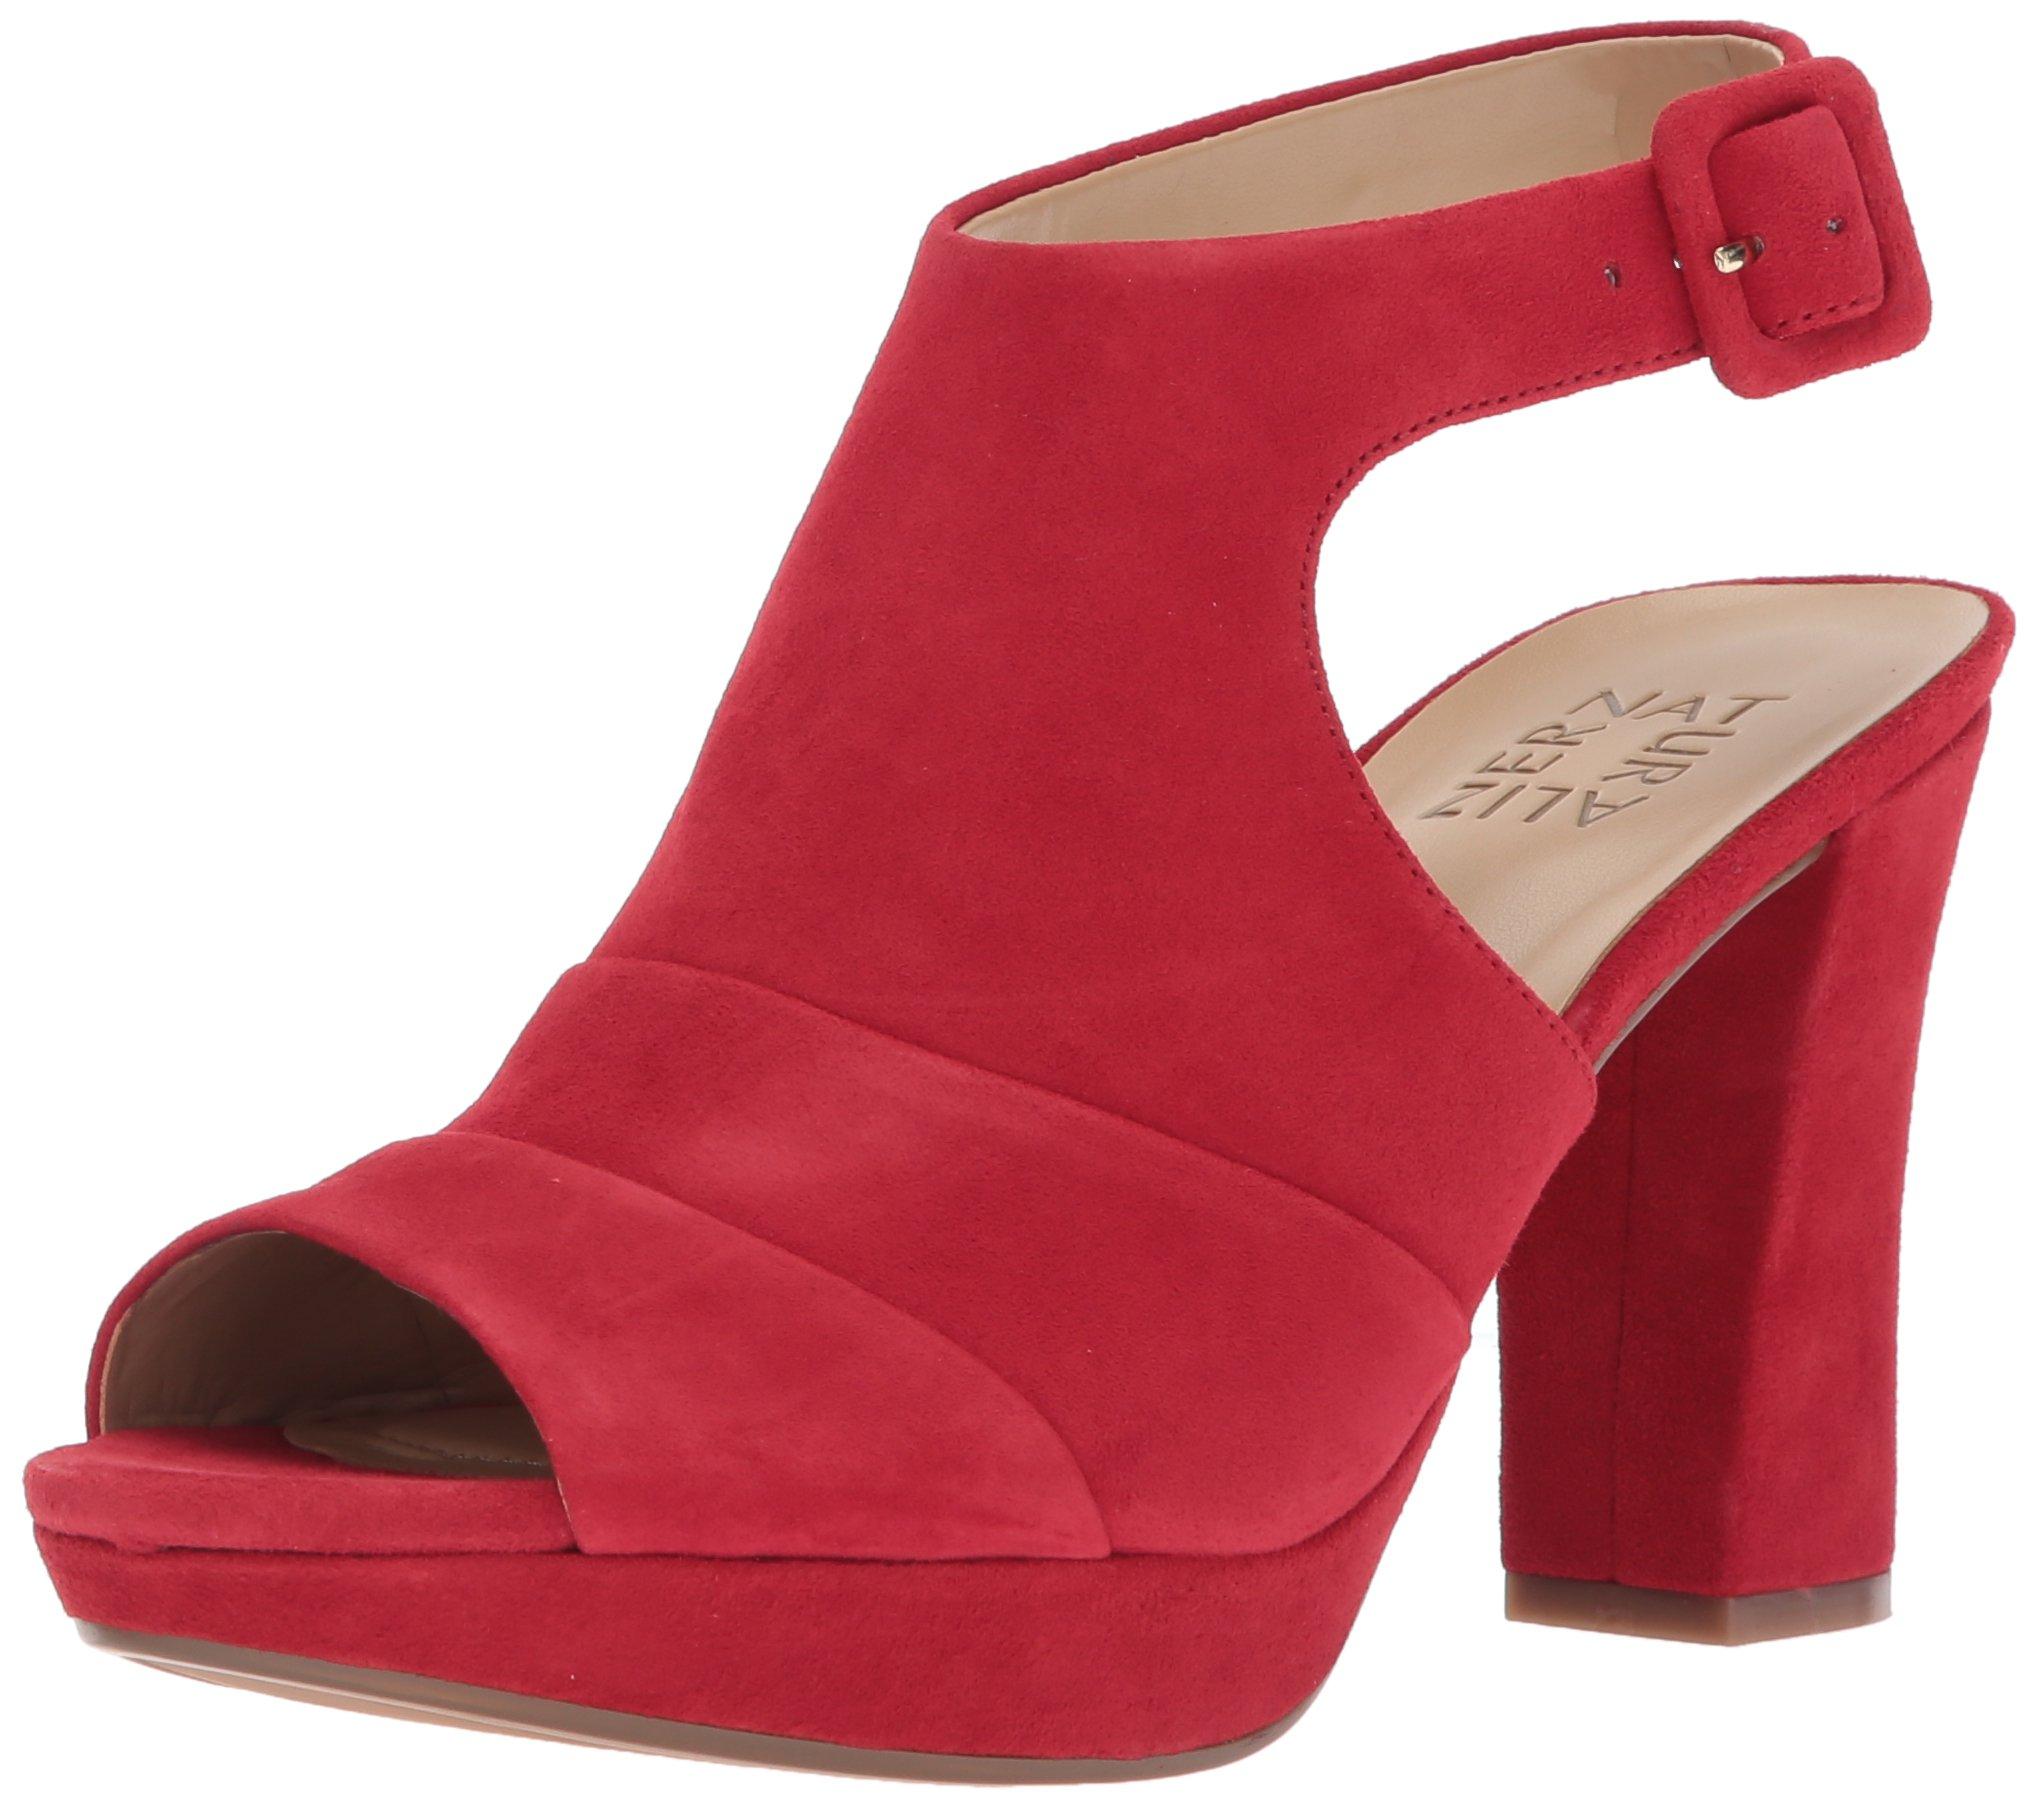 Naturalizer Women's Adrie Platform Dress Sandal, Red, 9.5 M US